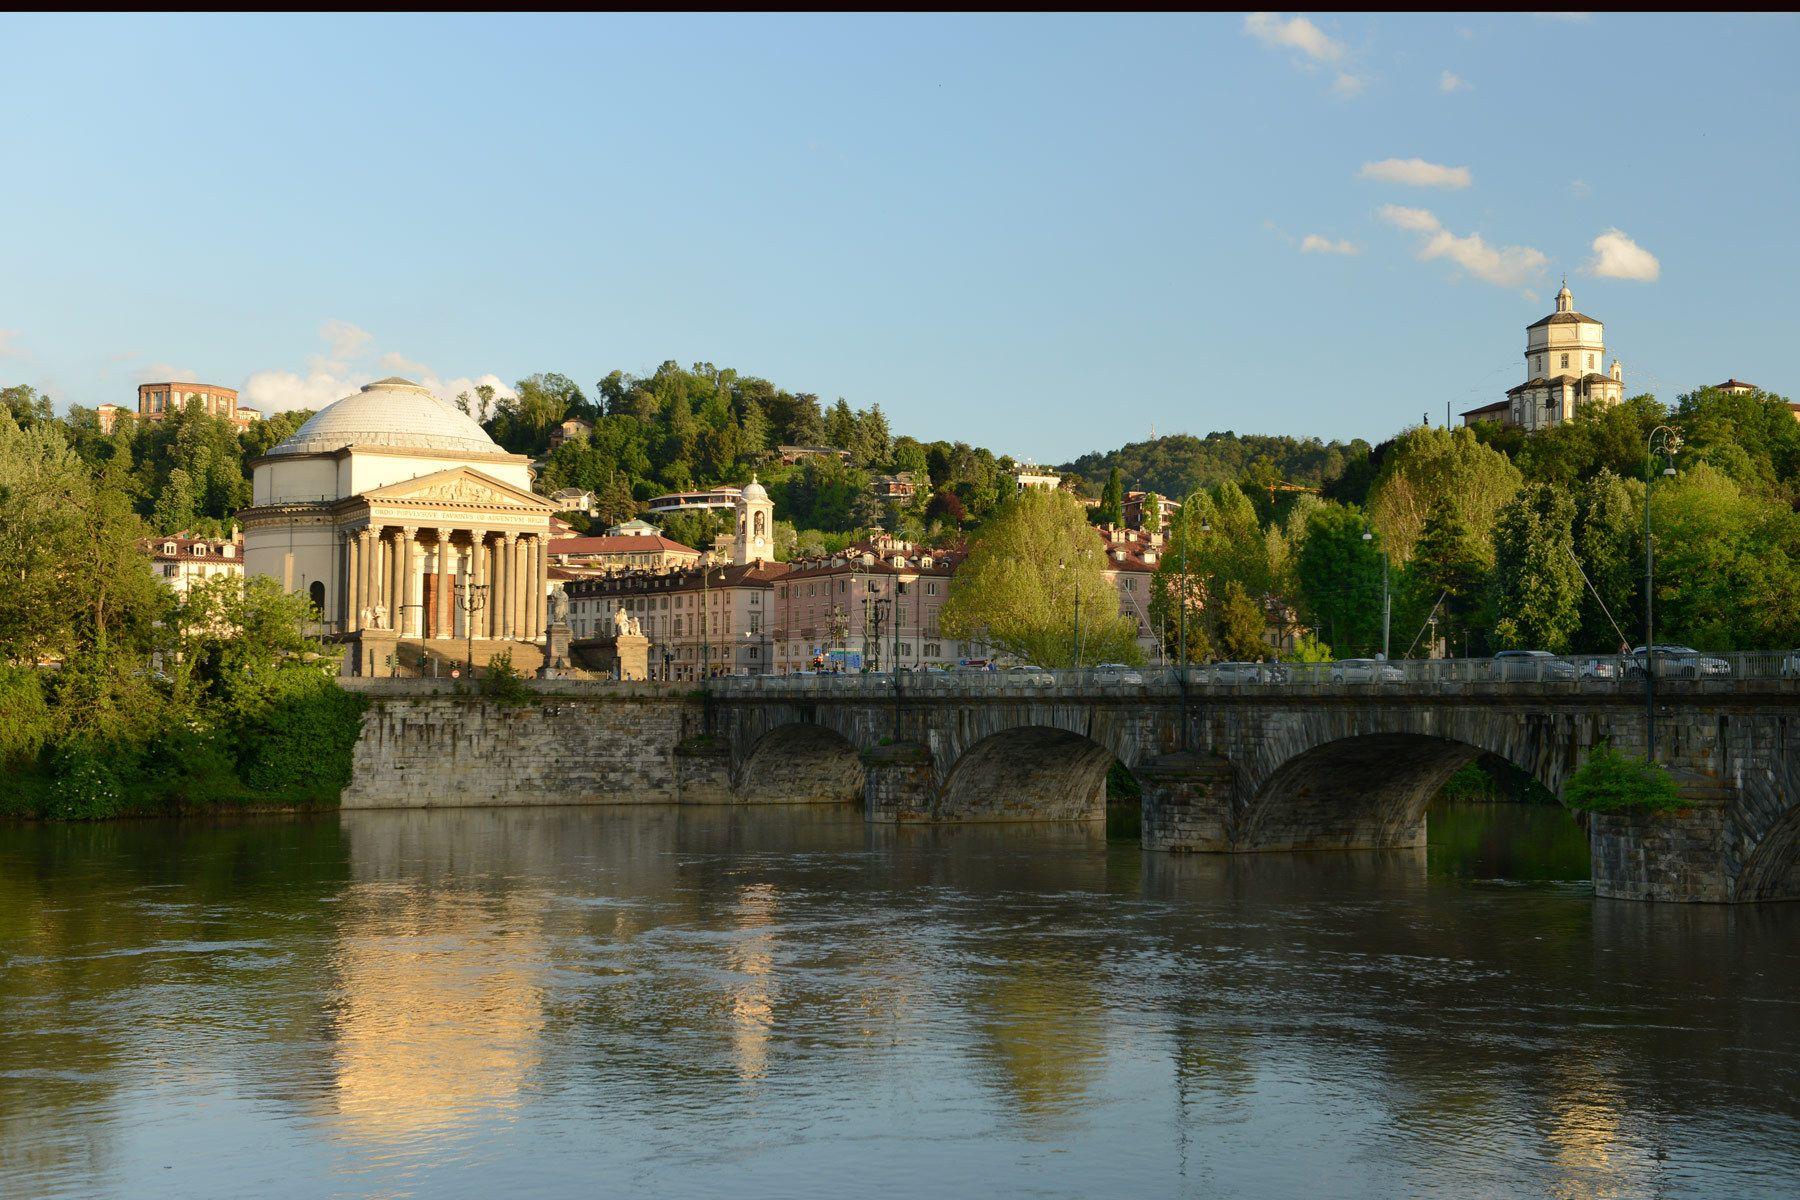 1gran_madre_po_river_turin_italy.jpg